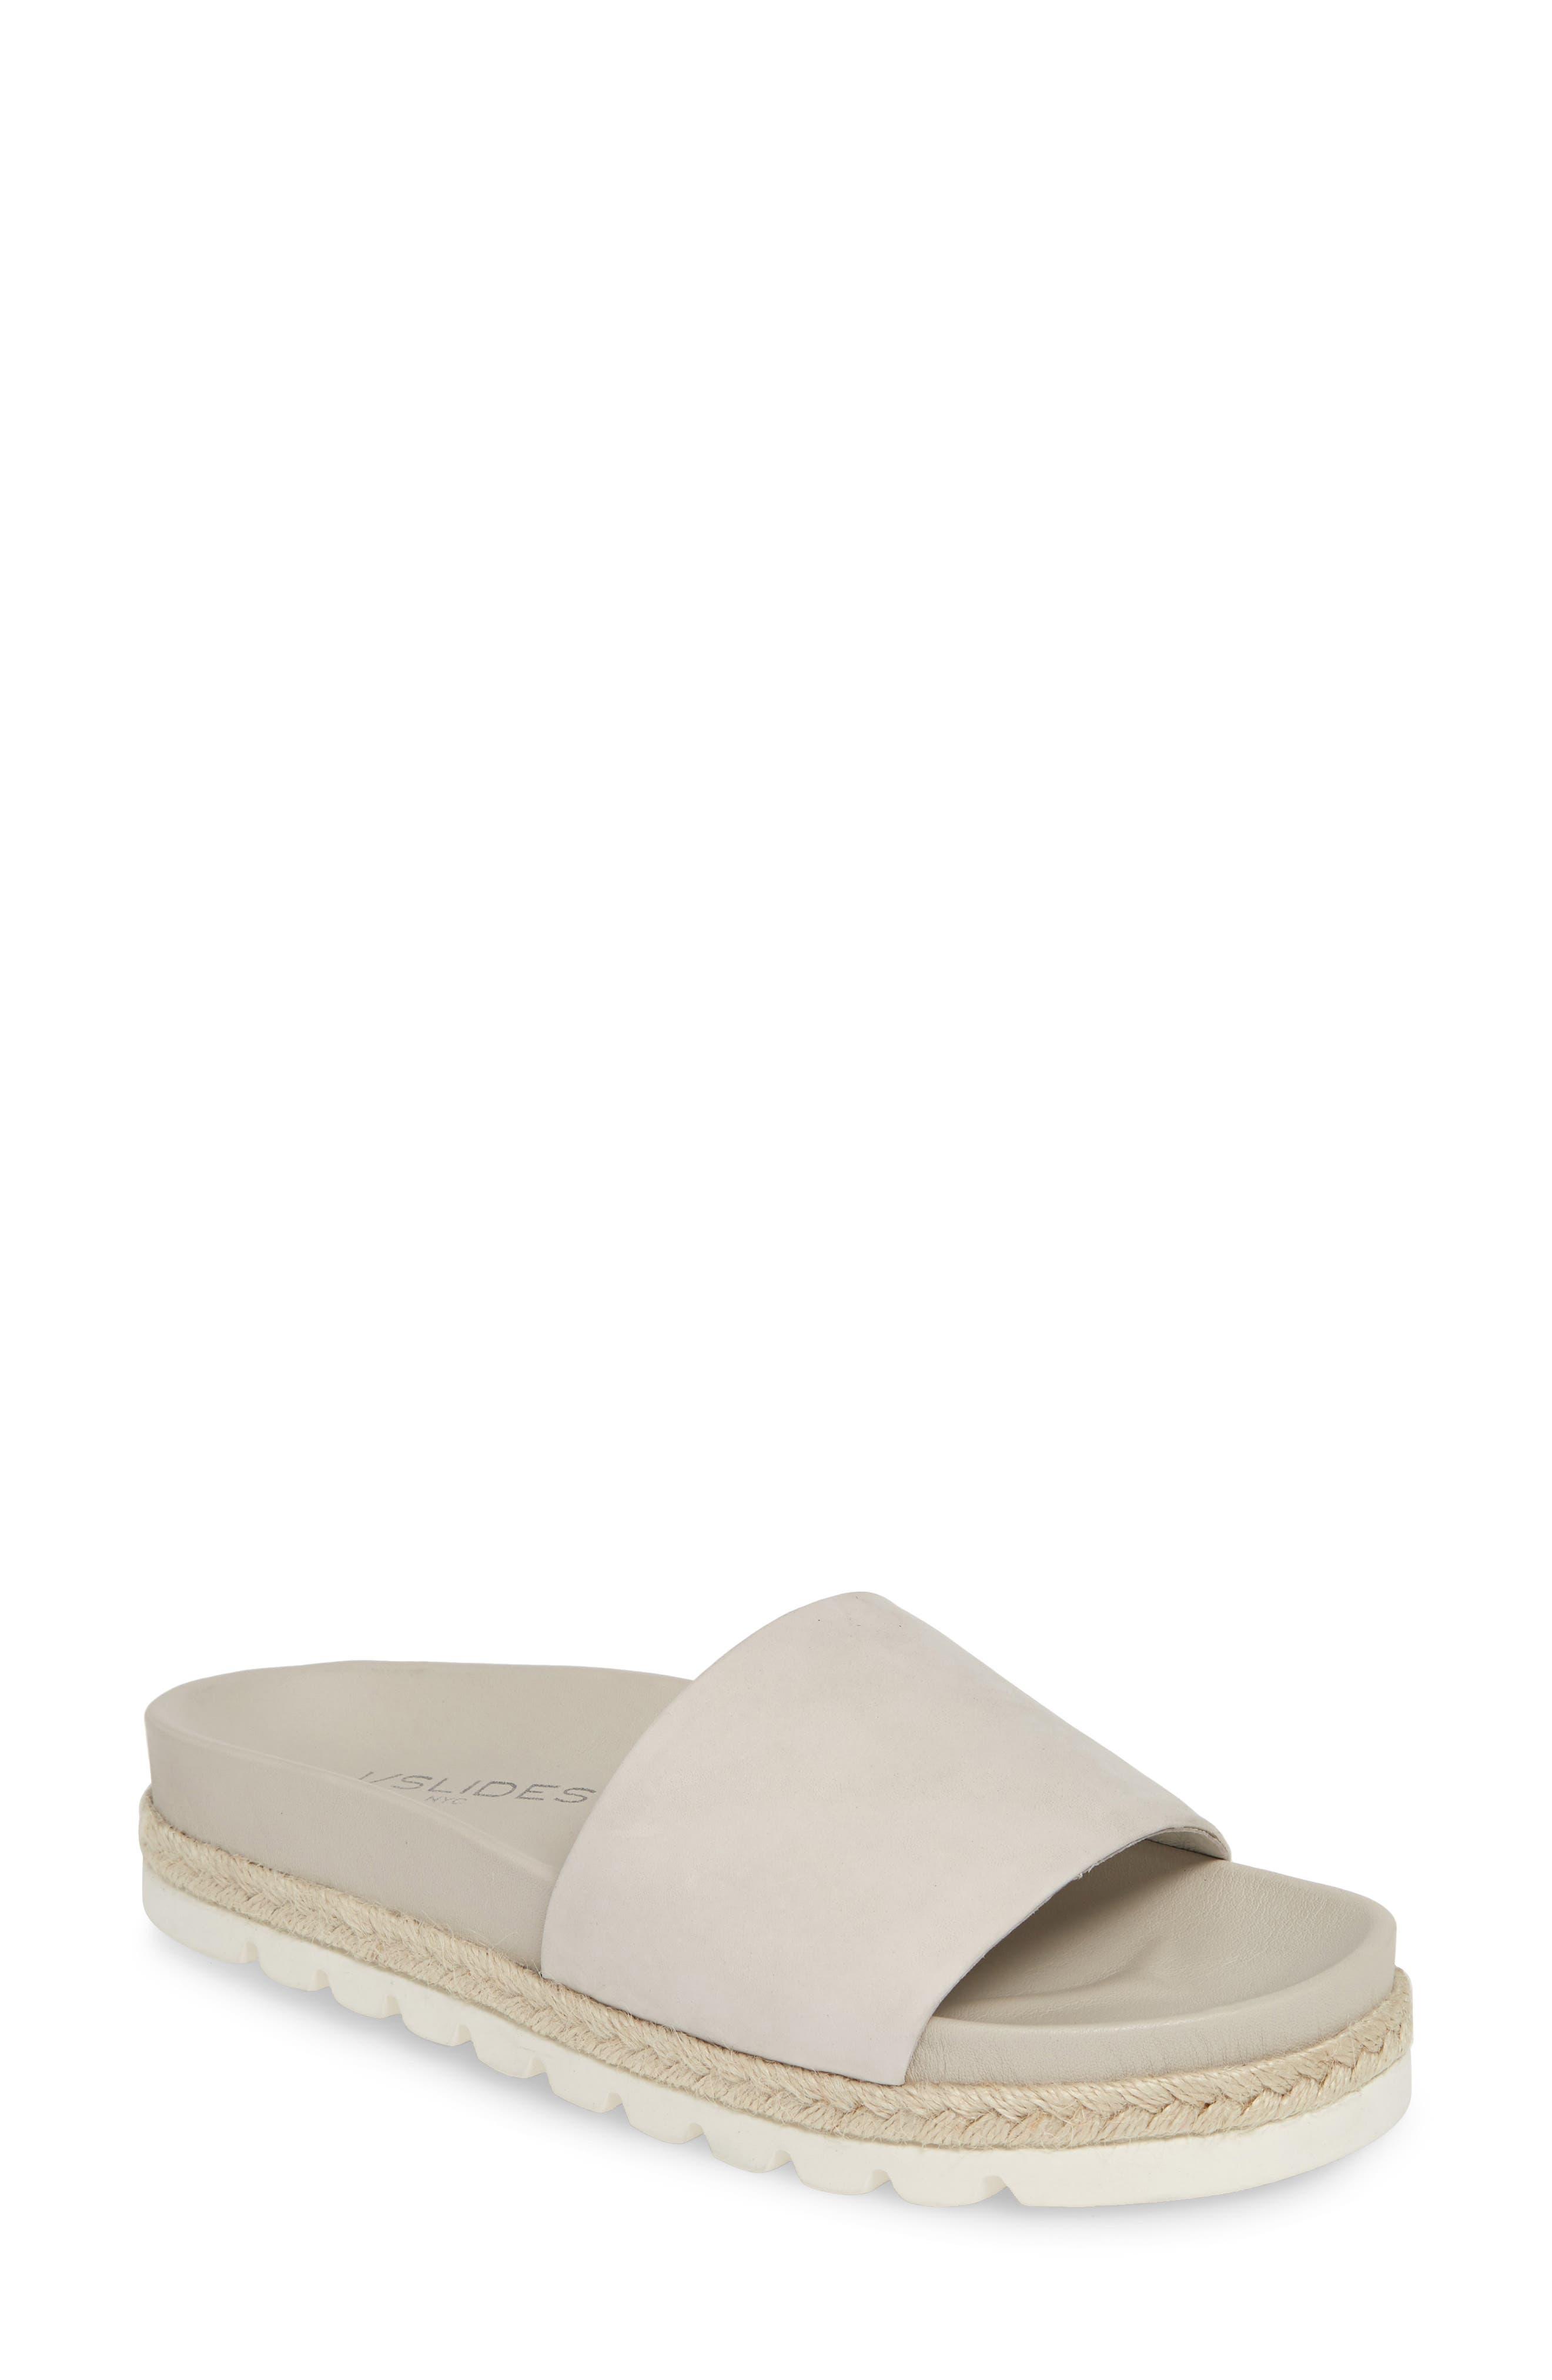 Jslides Espadrille Slide Sandal, White